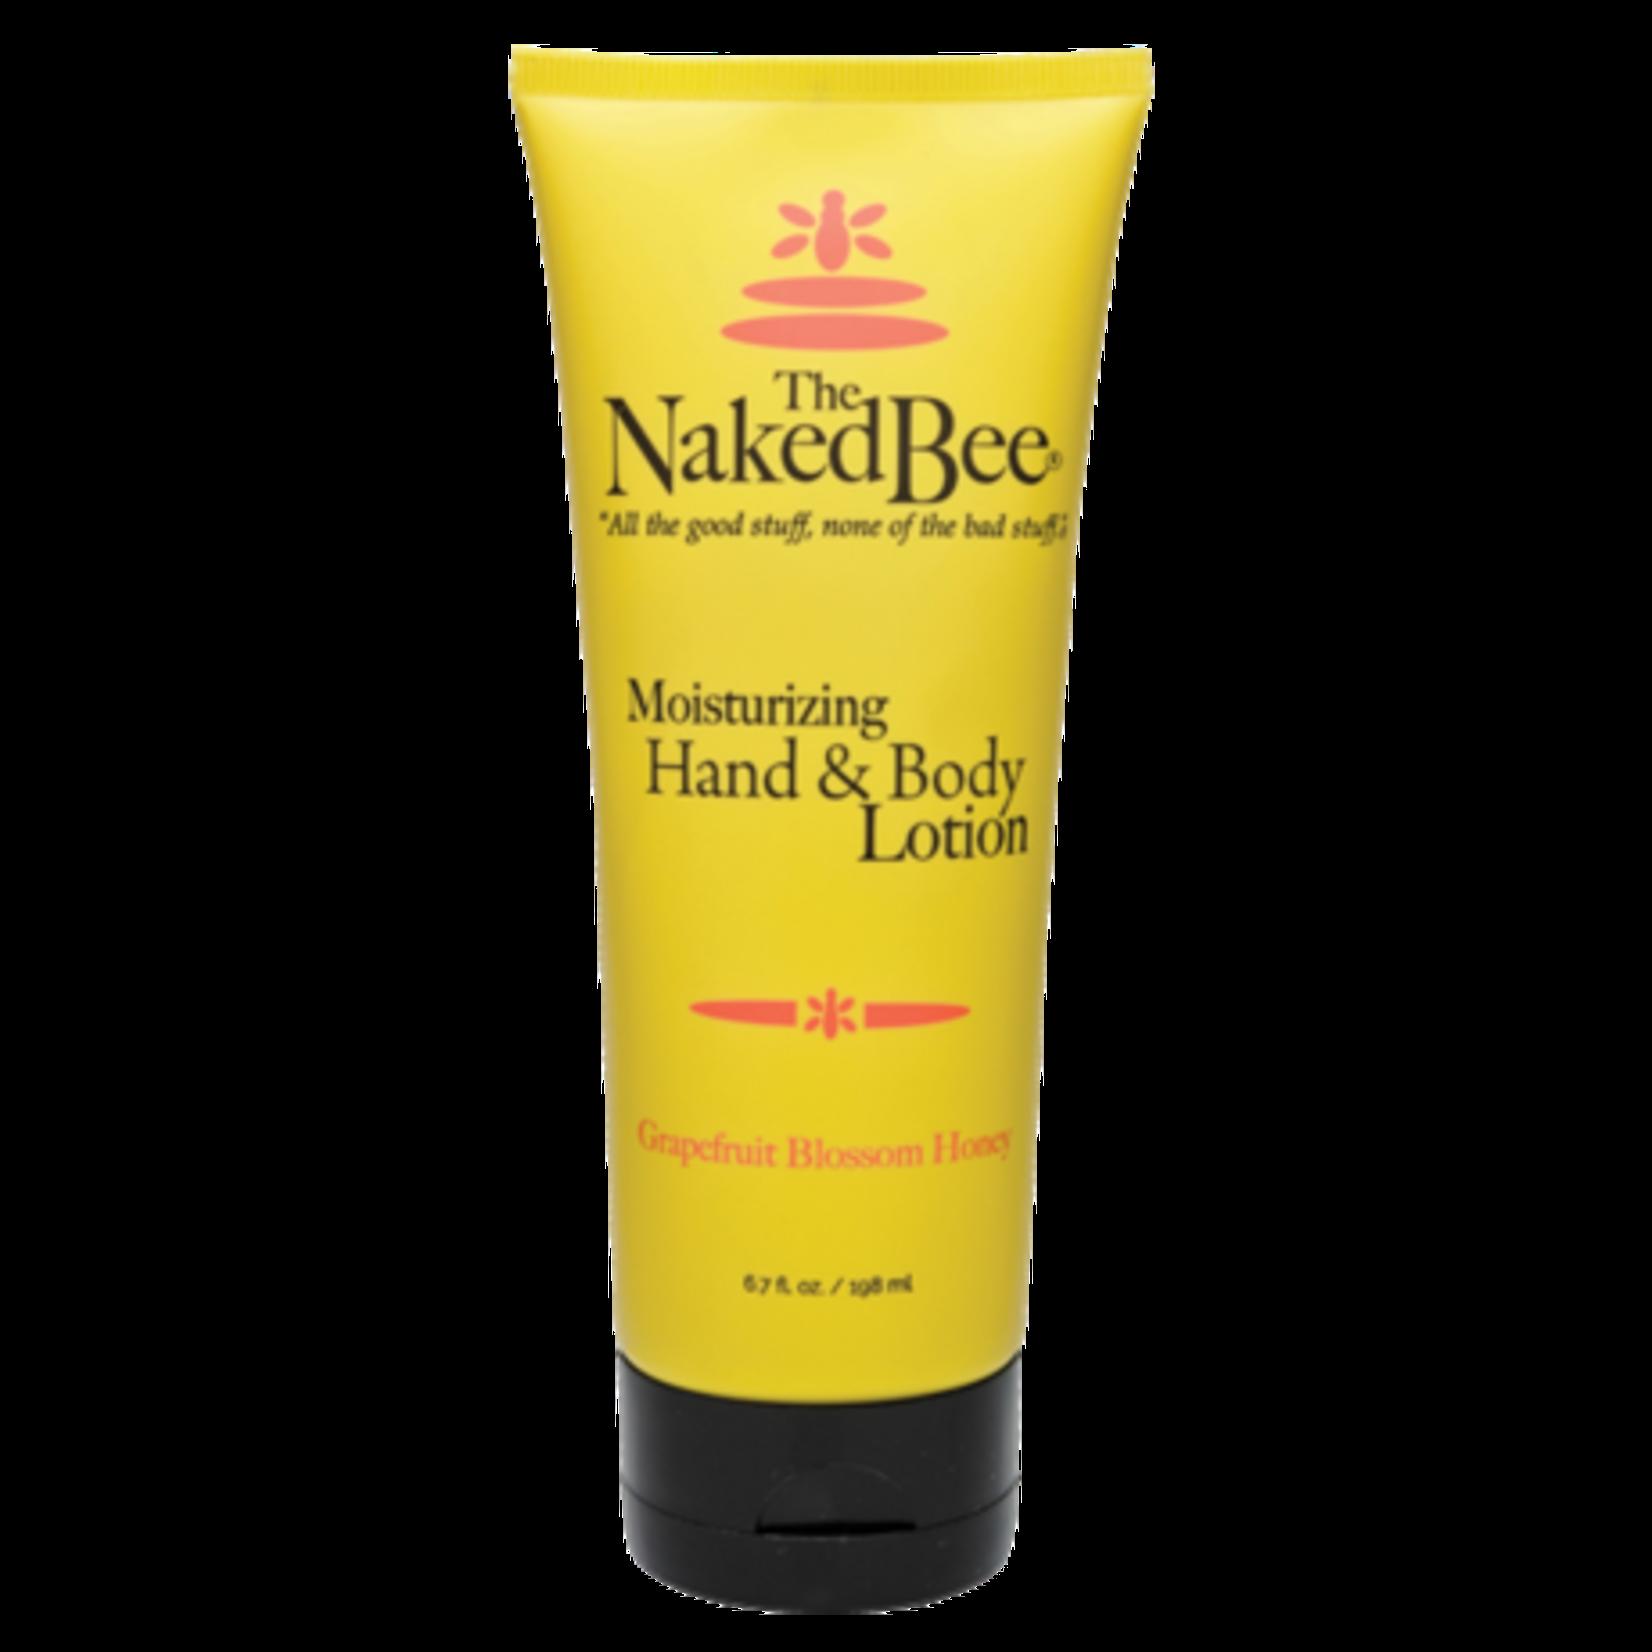 Naked Bee GRAPEFRUIT BLOSSOM HONEY HAND & BODY LOTION